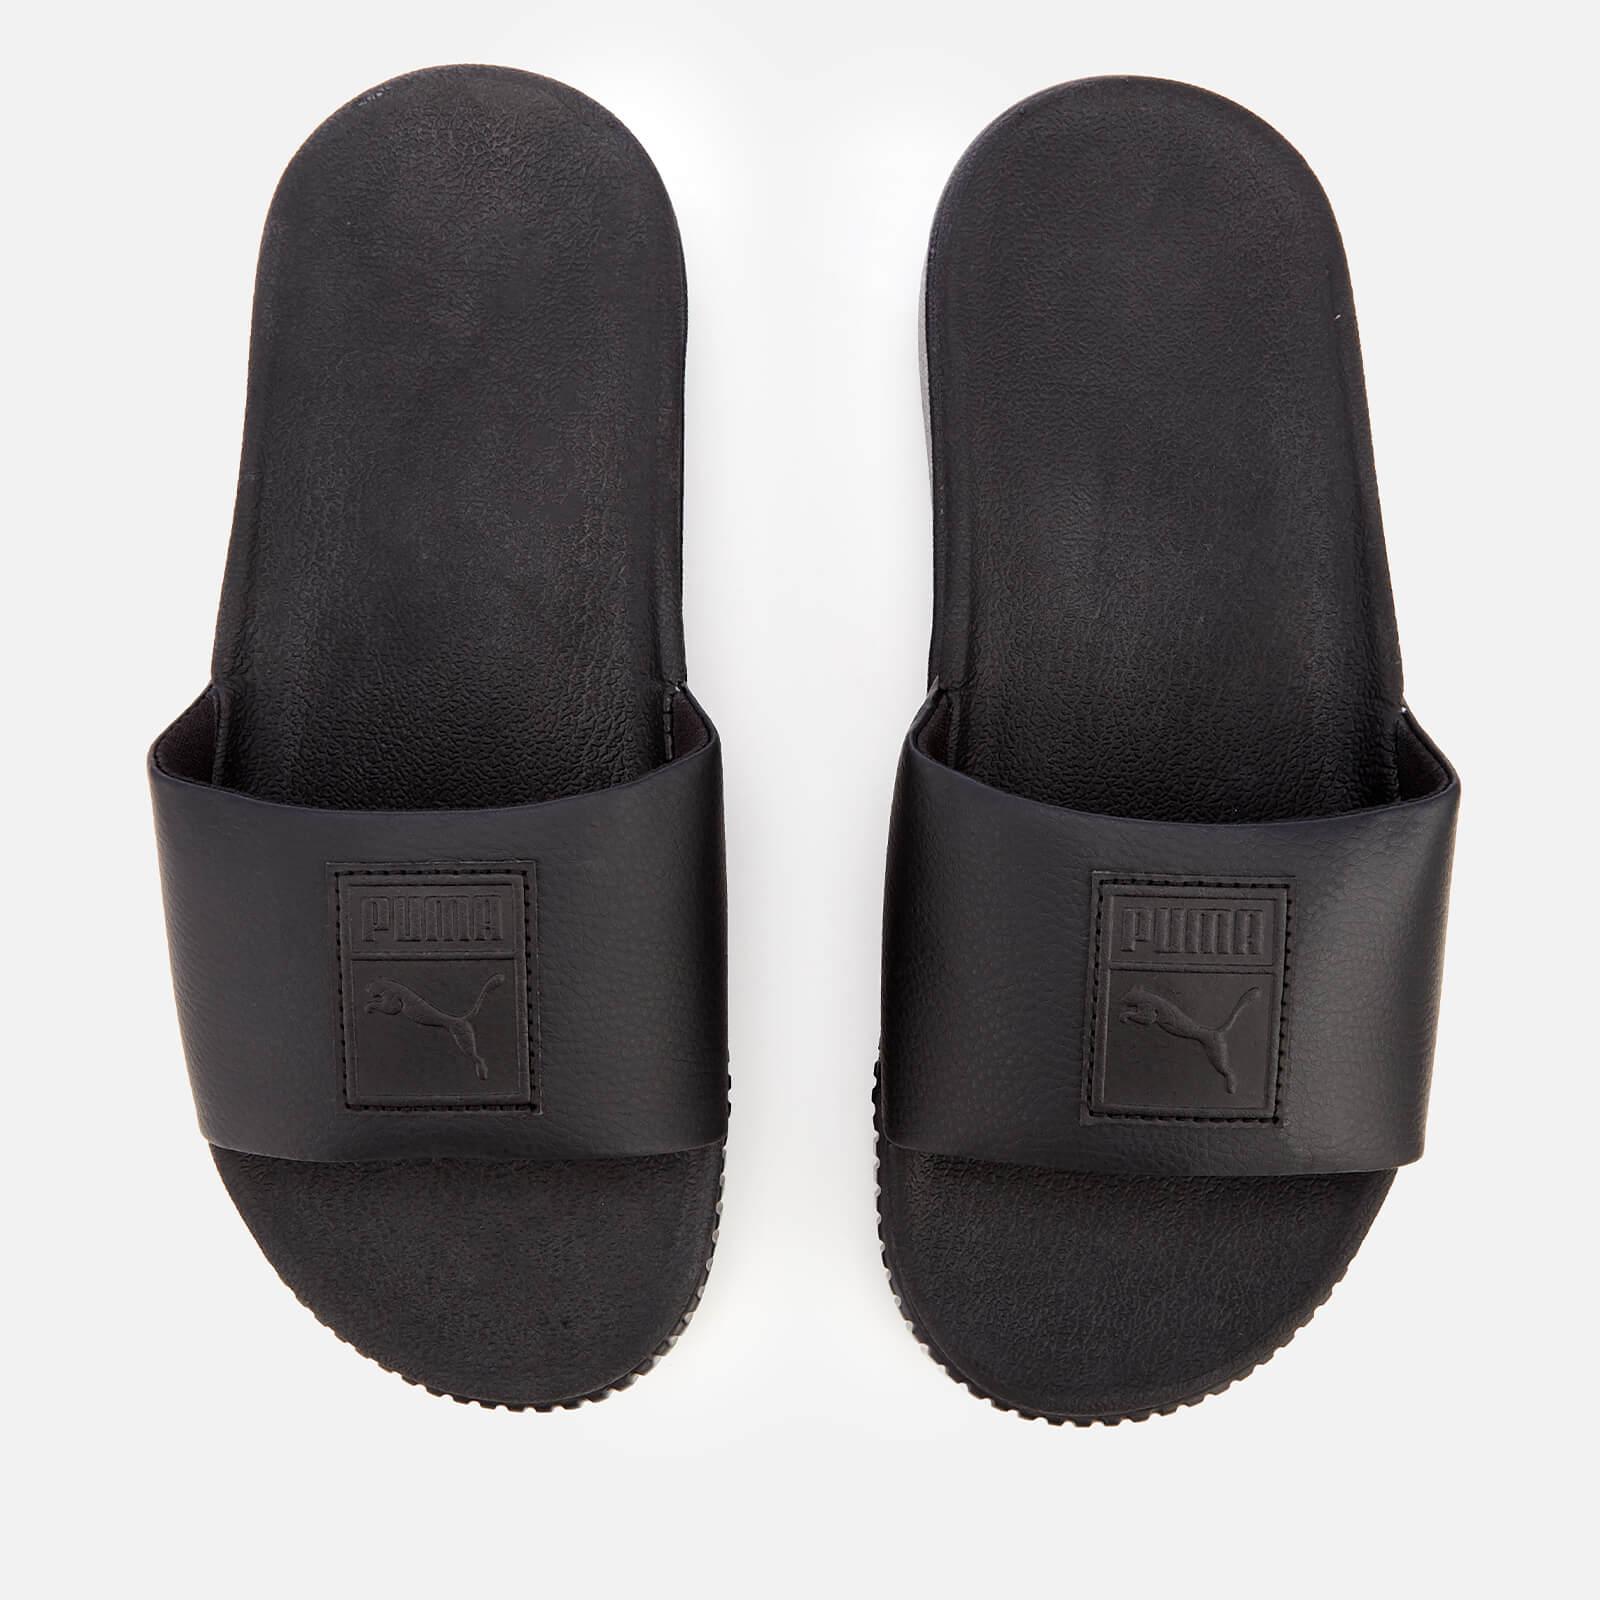 Puma Women's Platform Slide Sandals Puma BlackPuma Black